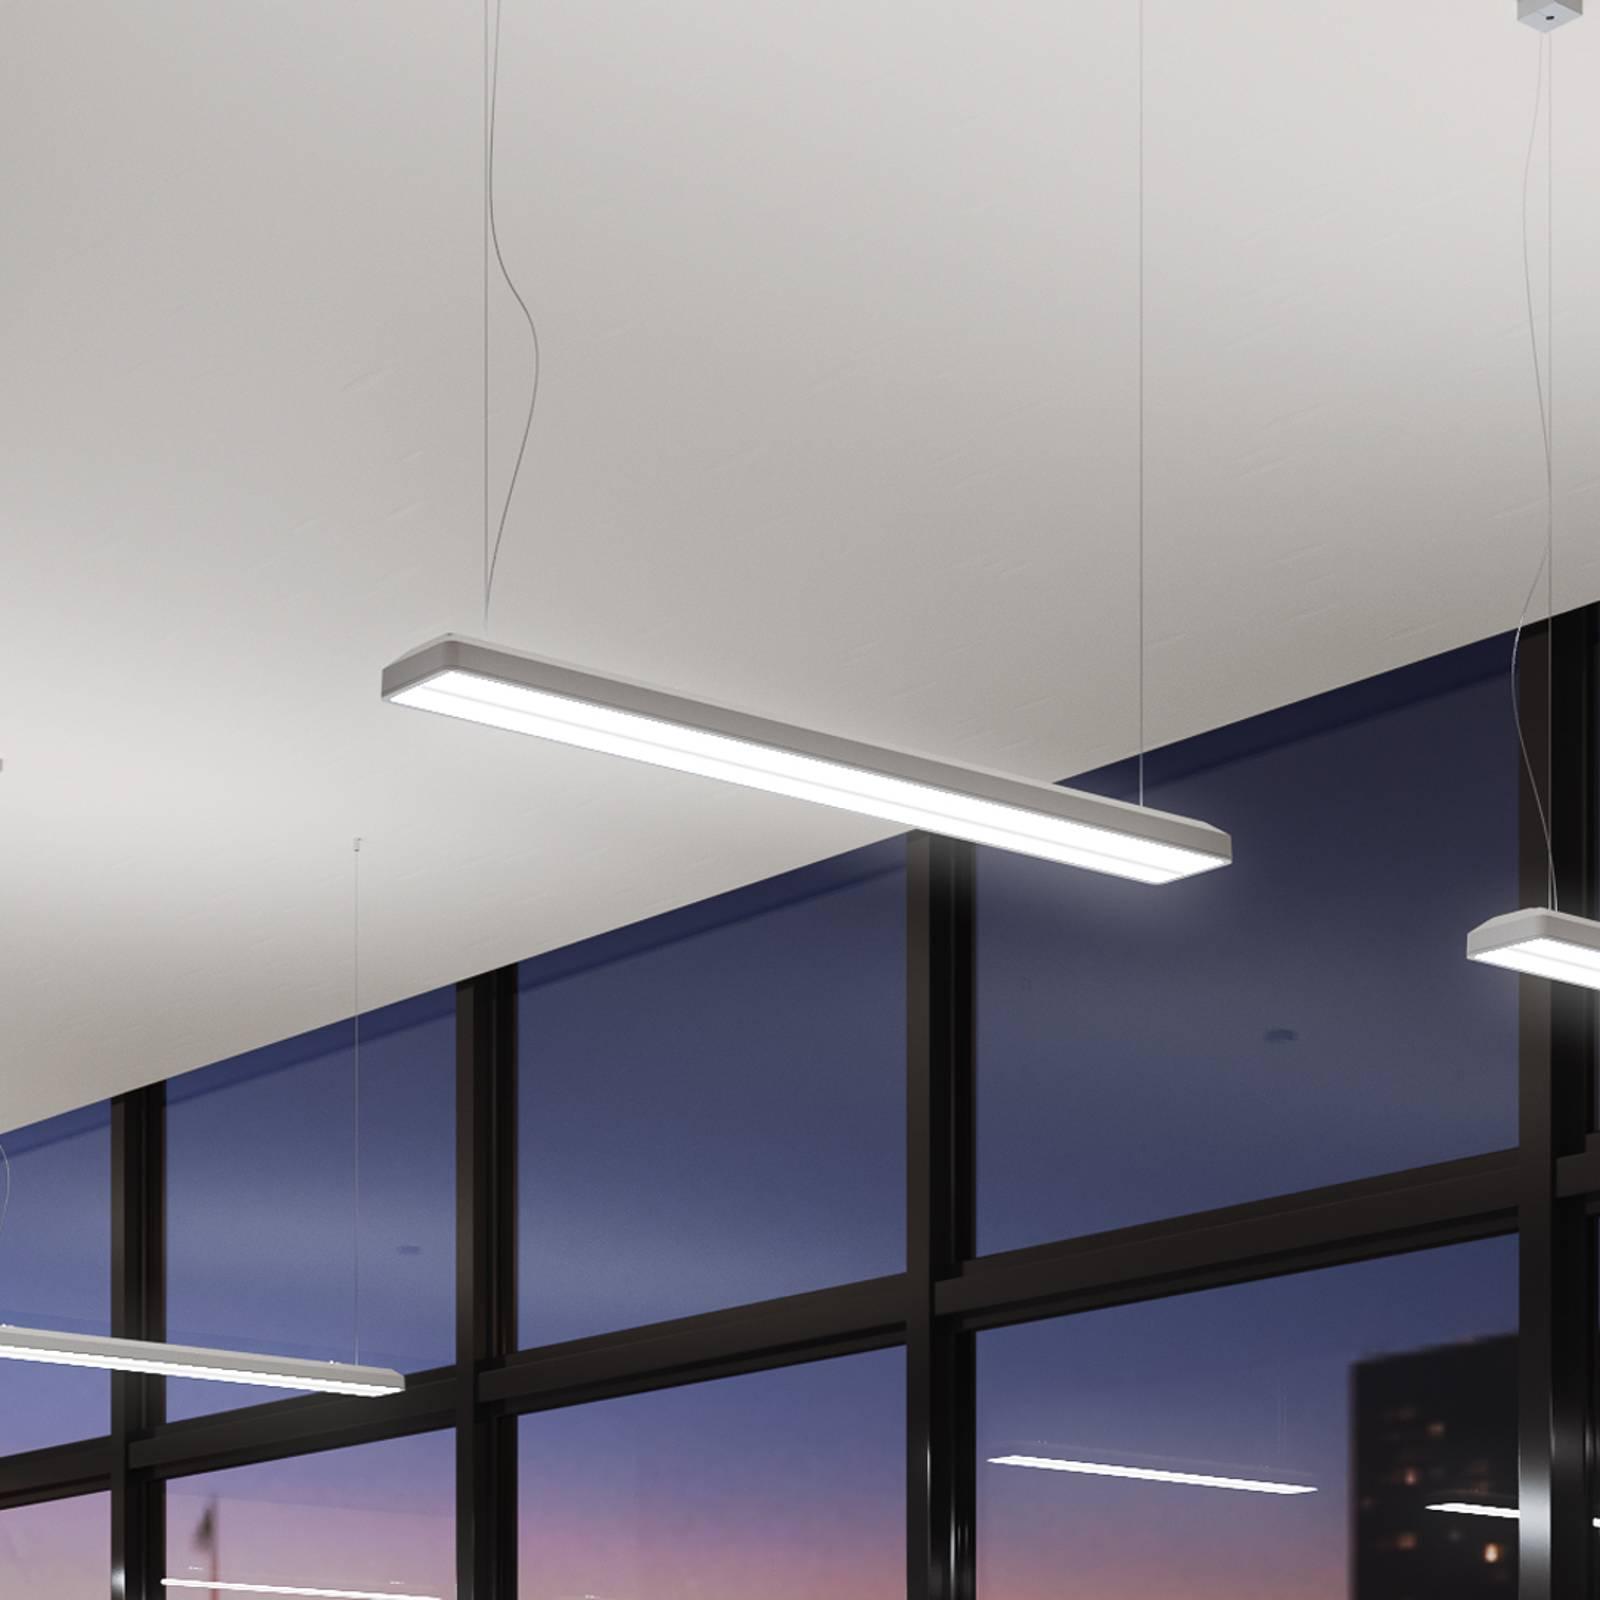 Siteco Taris LED-riippuvalo, DALI, himmennin 123cm